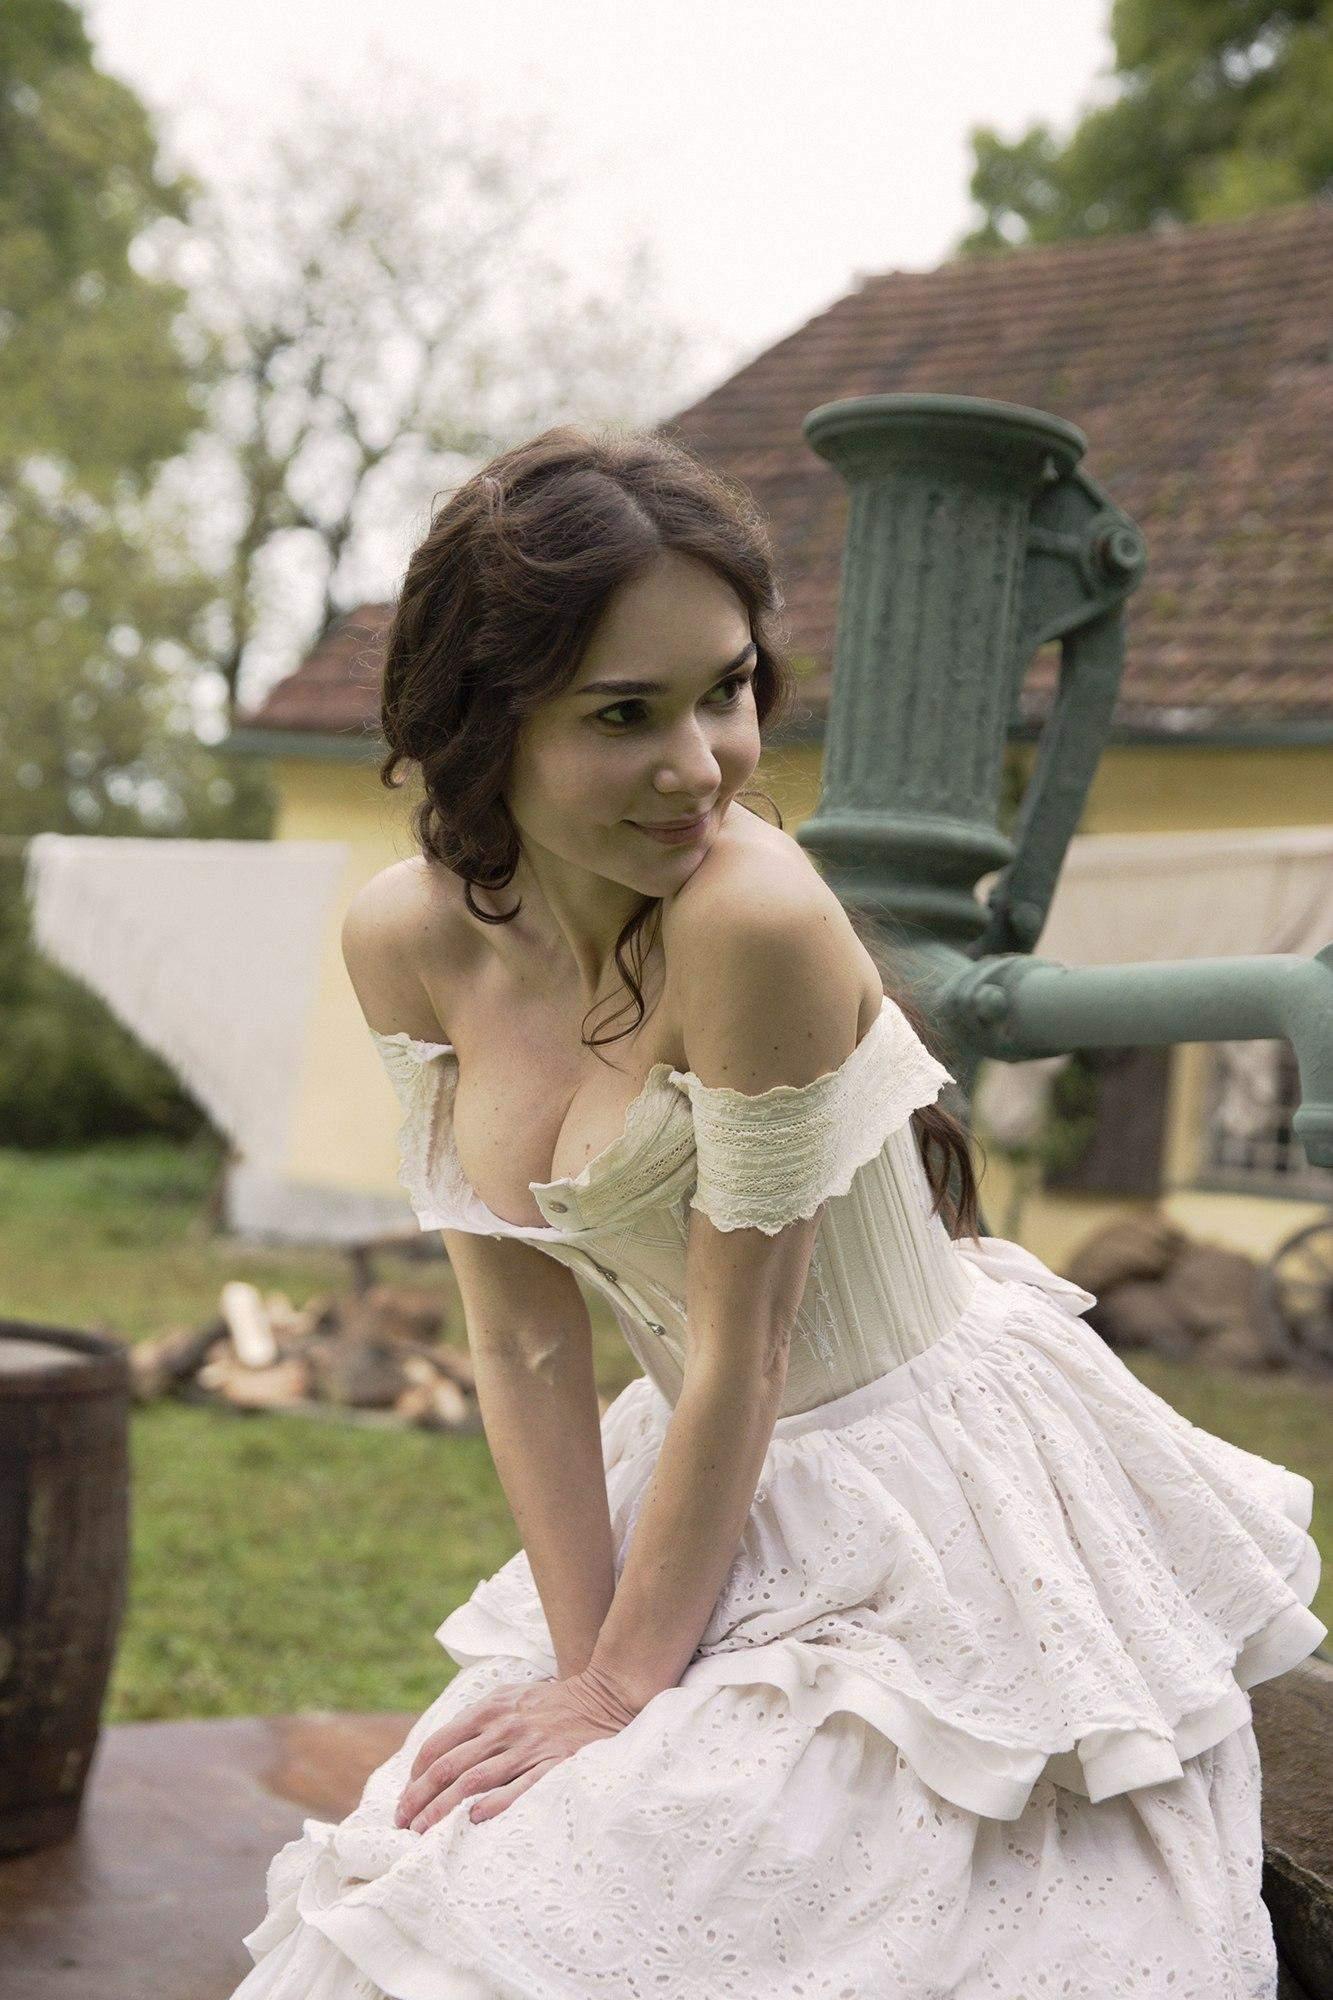 Олена Лавренюк у серіалі